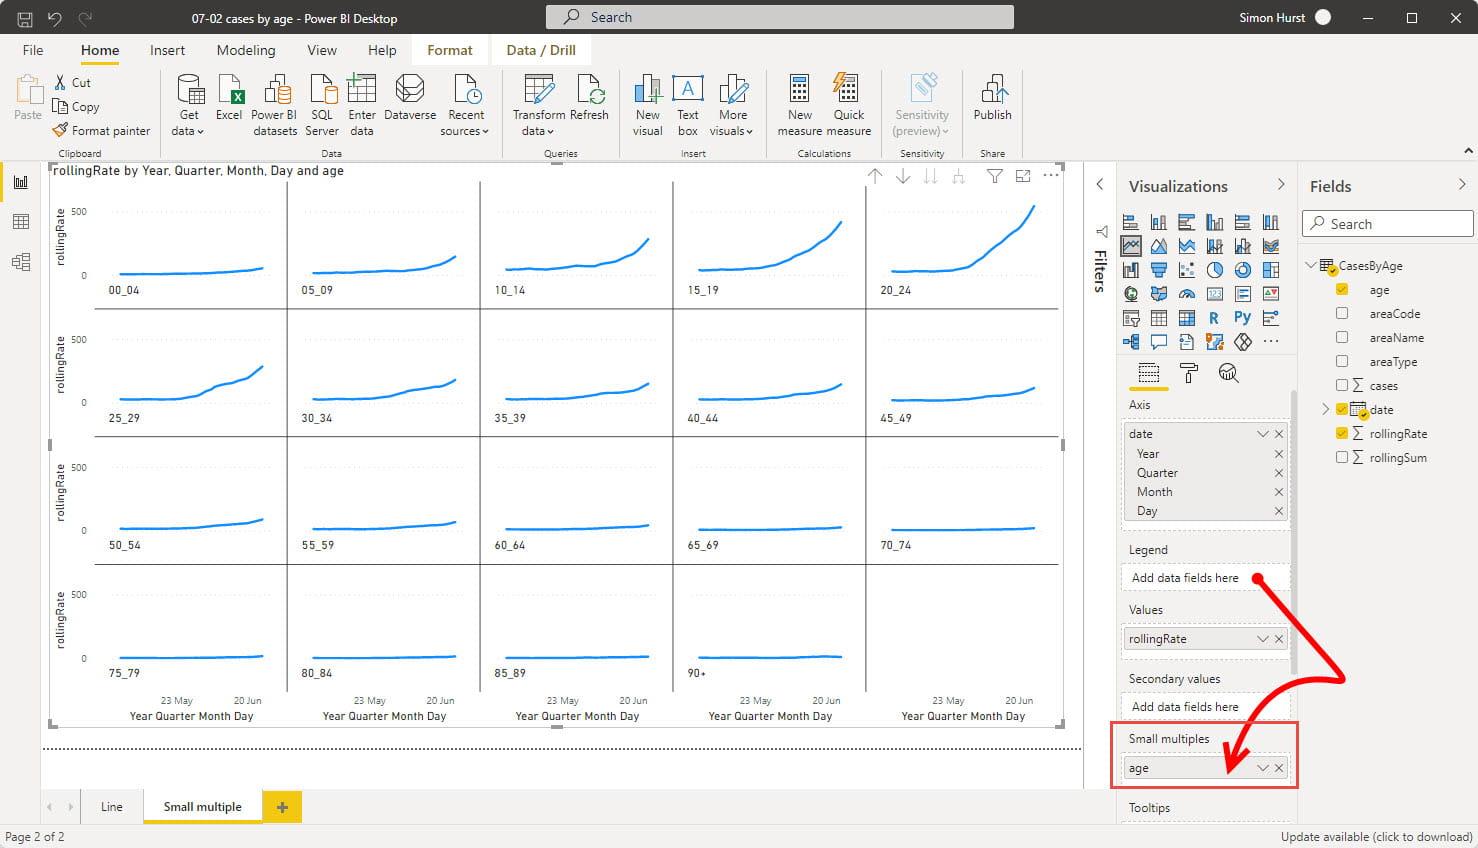 screenshot from Power Bi